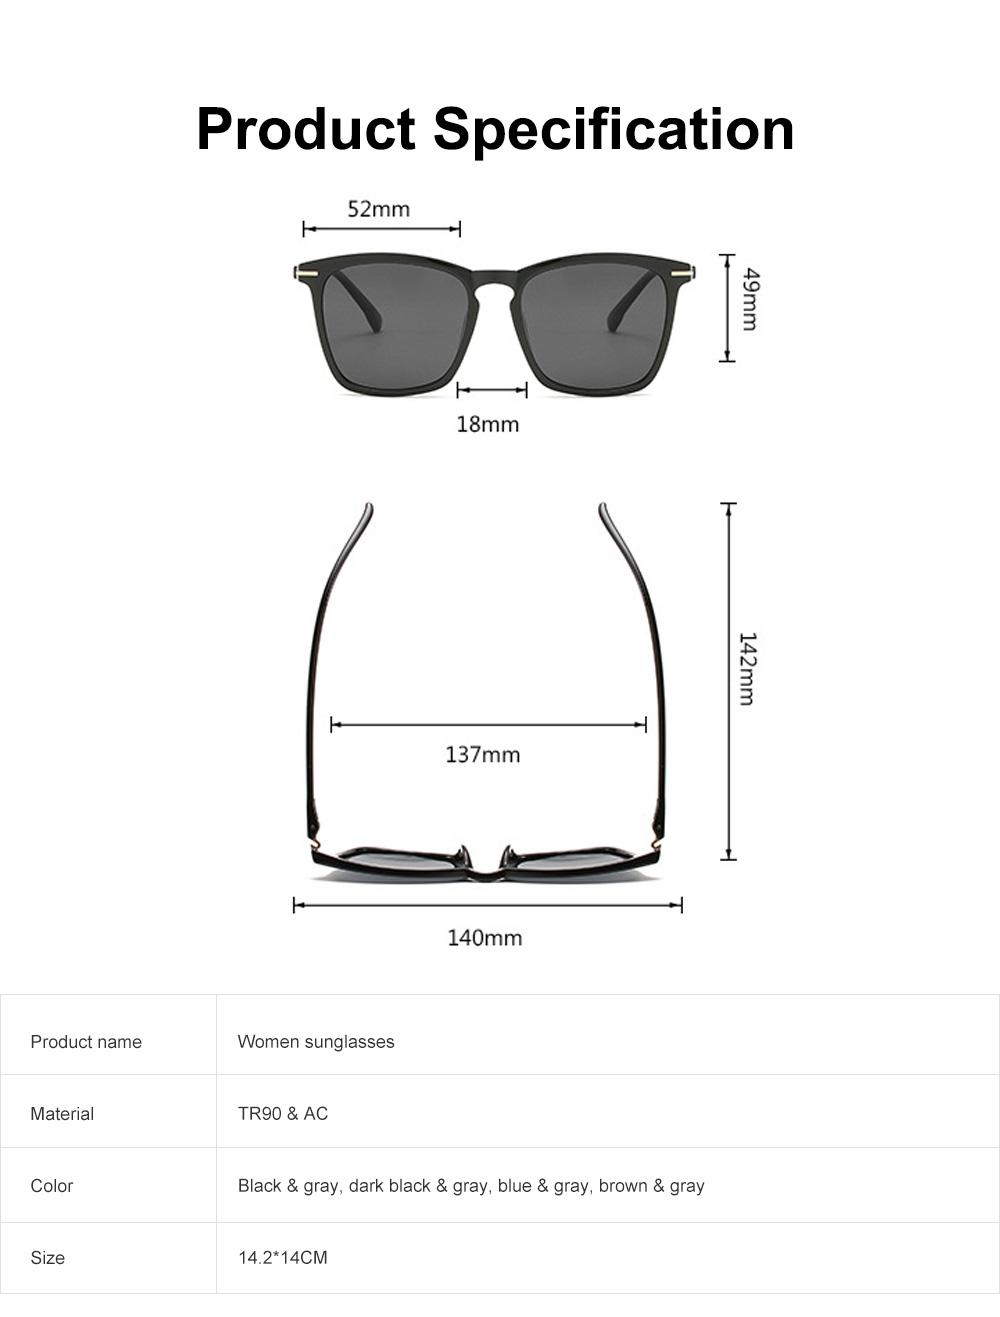 Retro Polarized Sunglasses Vintage Style with UV400 Protection & Anti-Glare Lens for Women 6